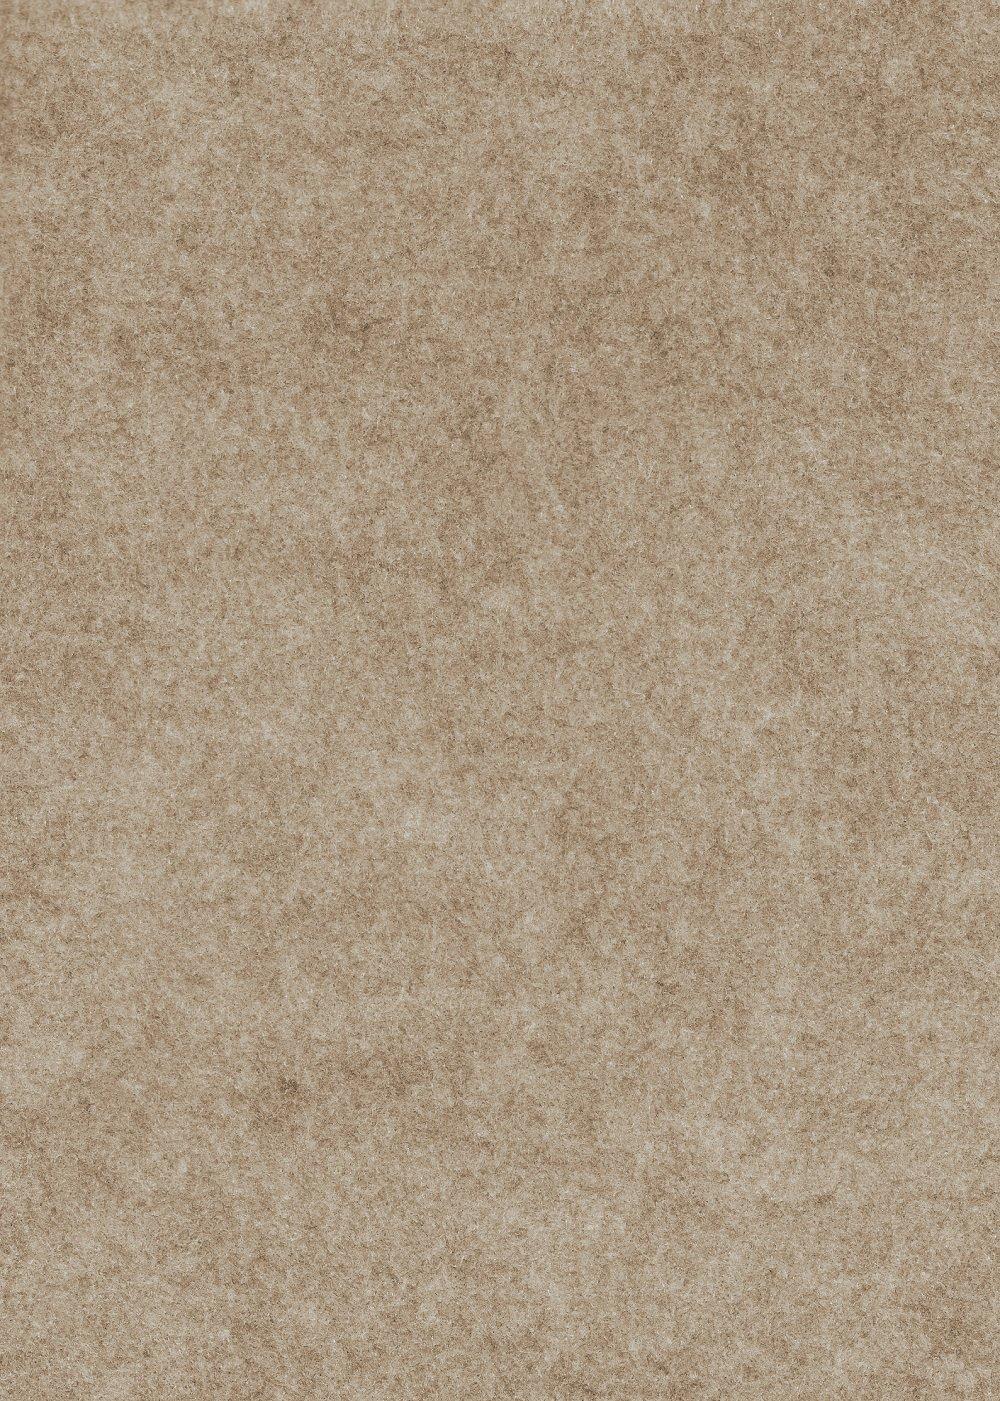 Driftwood - 12 x 18 Square